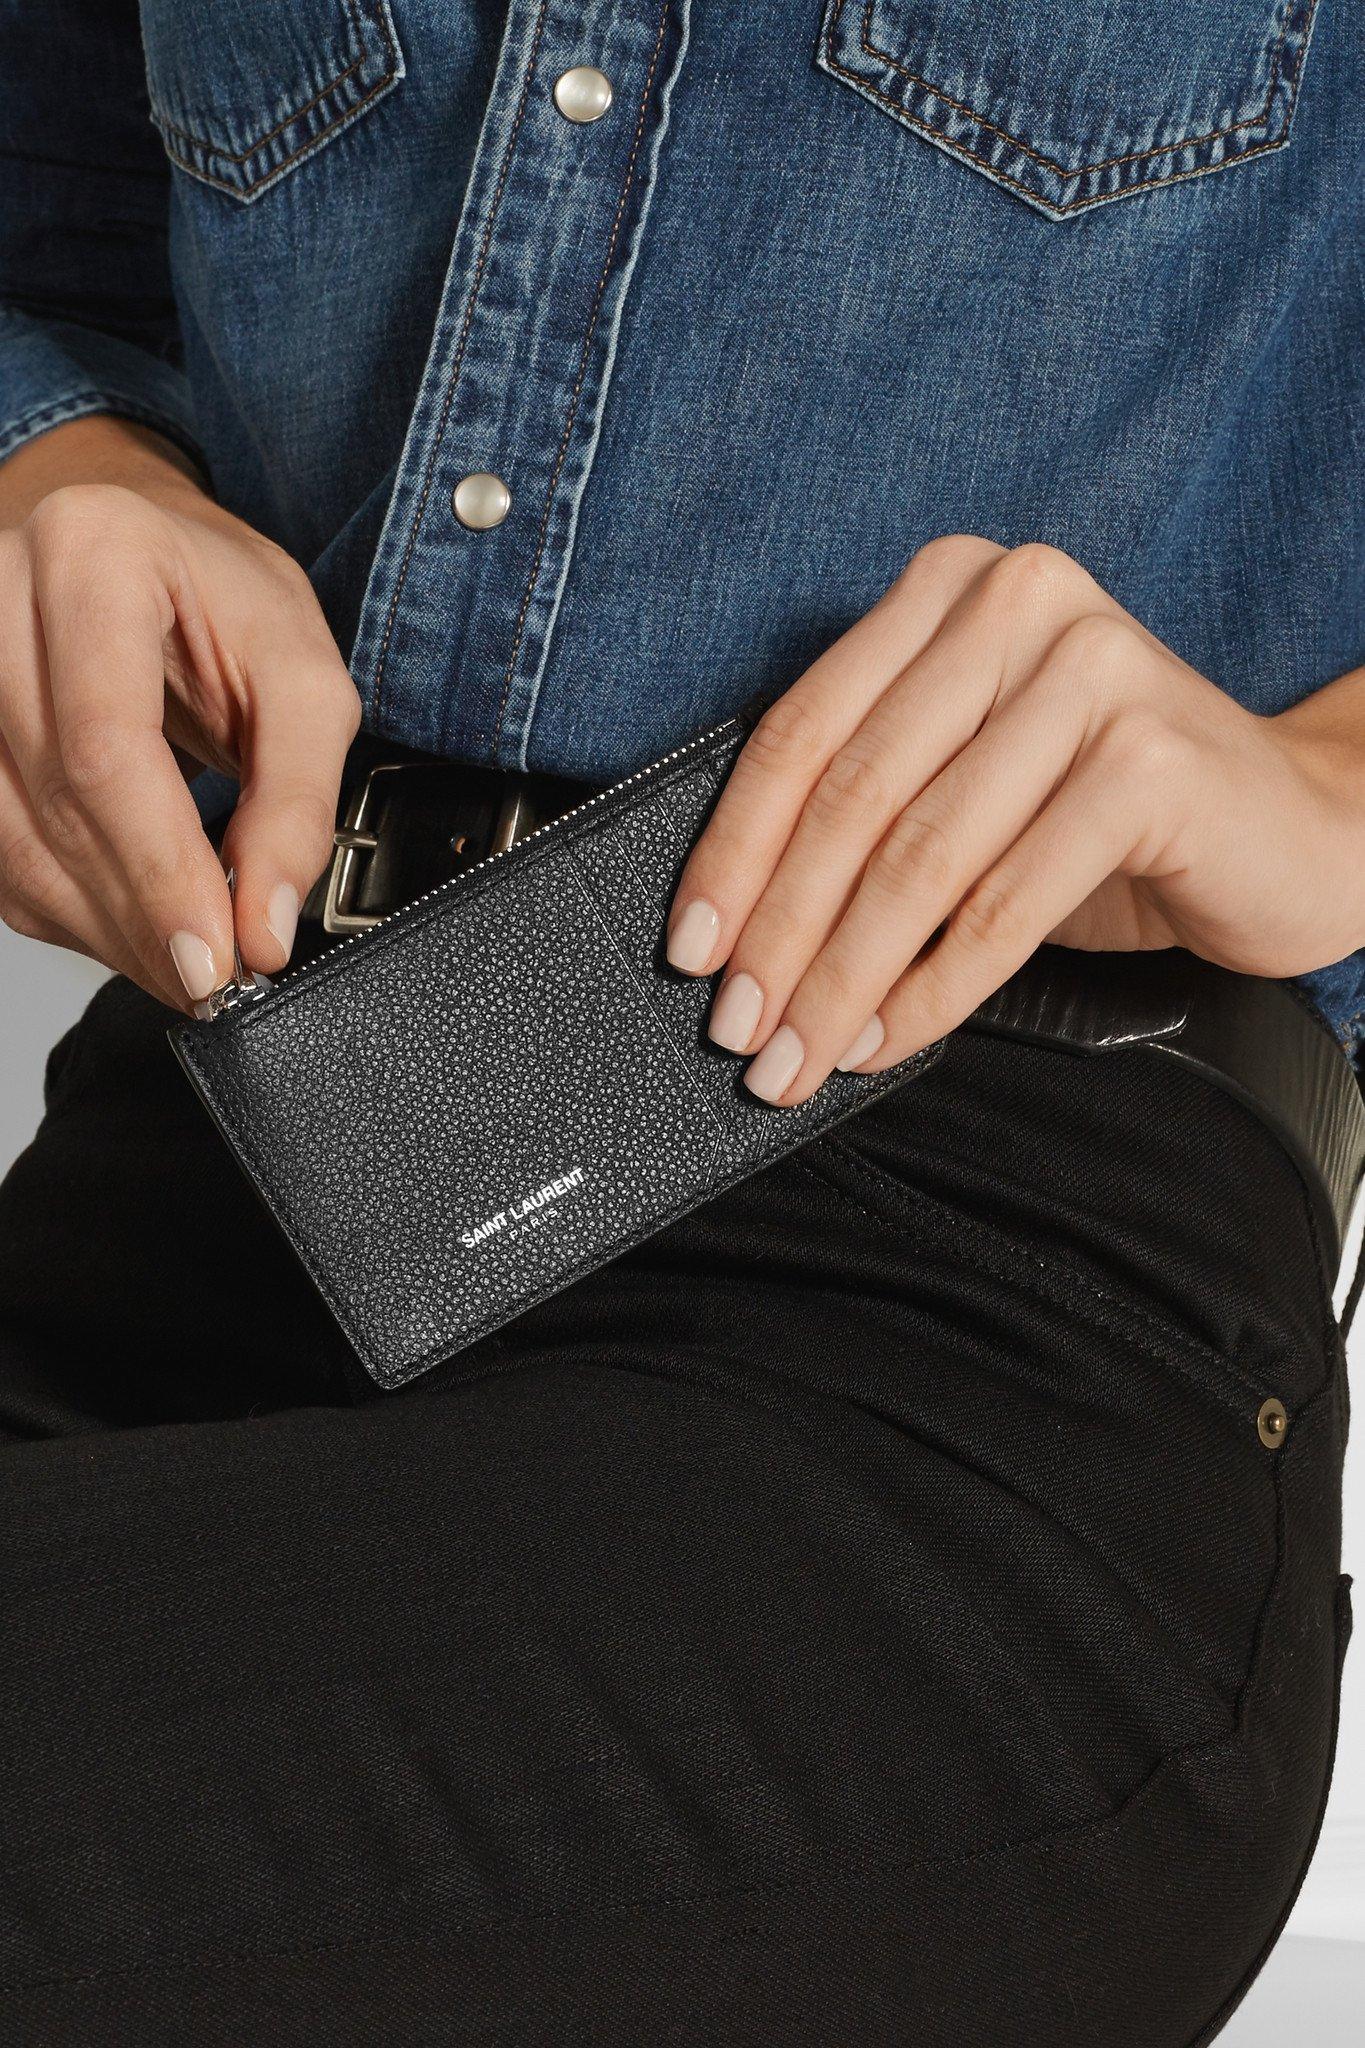 10761d61da2 Saint Laurent Textured-leather Cardholder in Black - Lyst